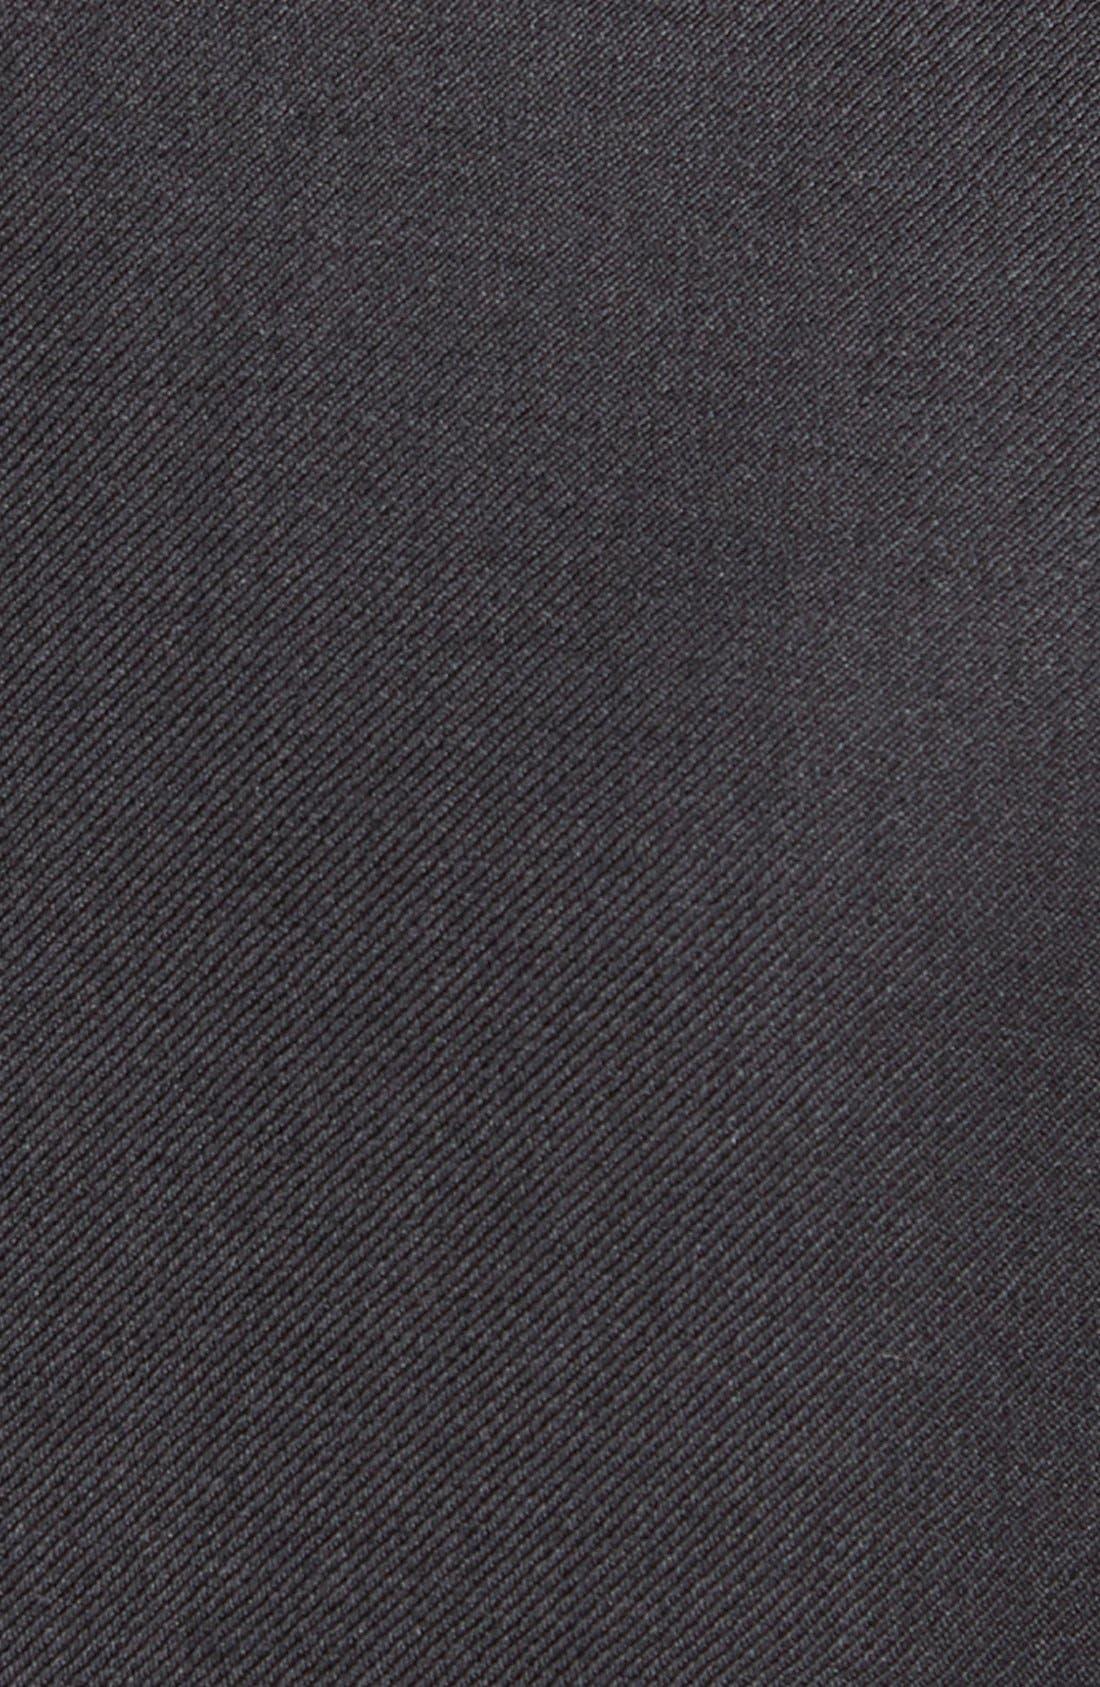 Alternate Image 7  - Hickey Freeman Classic B Fit Tasmanian Wool Tuxedo